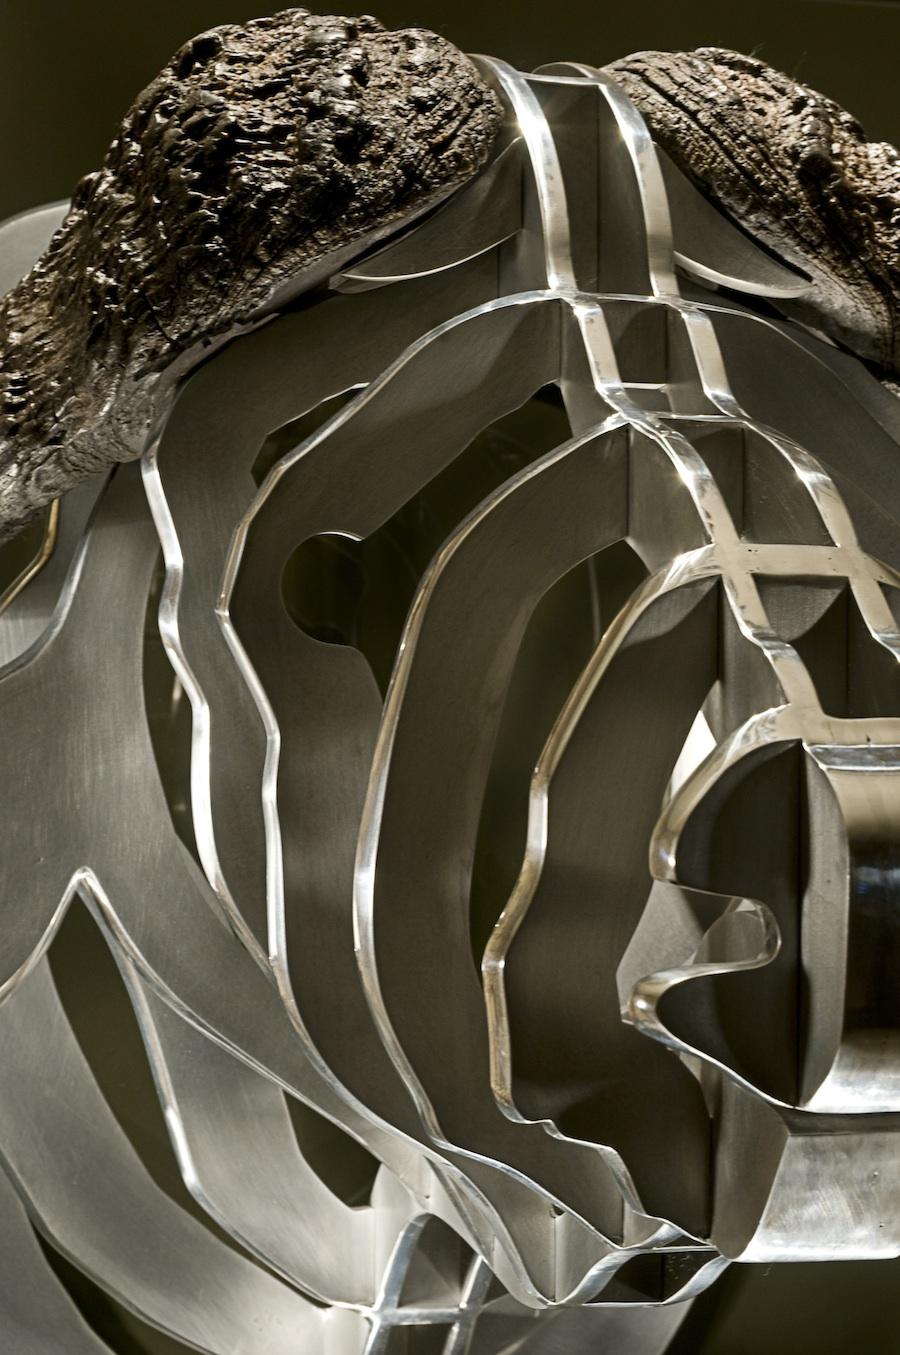 jean-octobon-buffalo-sculpture-metal.jpg